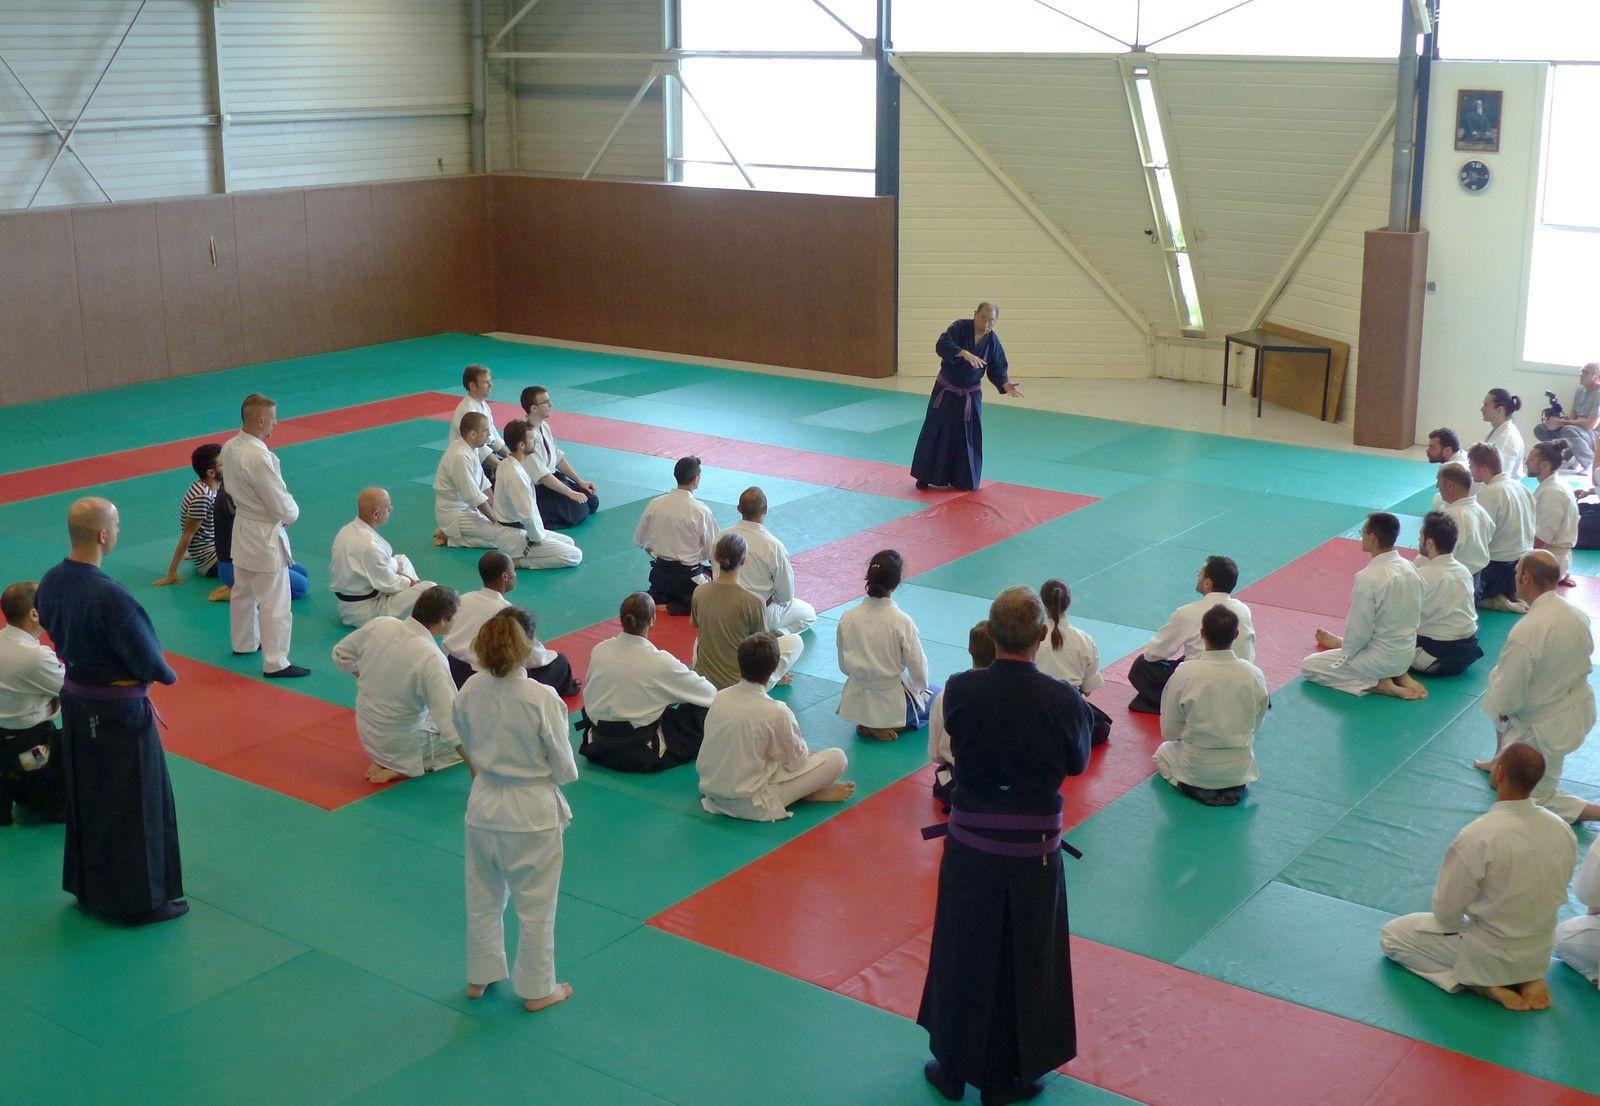 Yasuhiro Irie en plein cours (auteur : Aïki-kohaï)